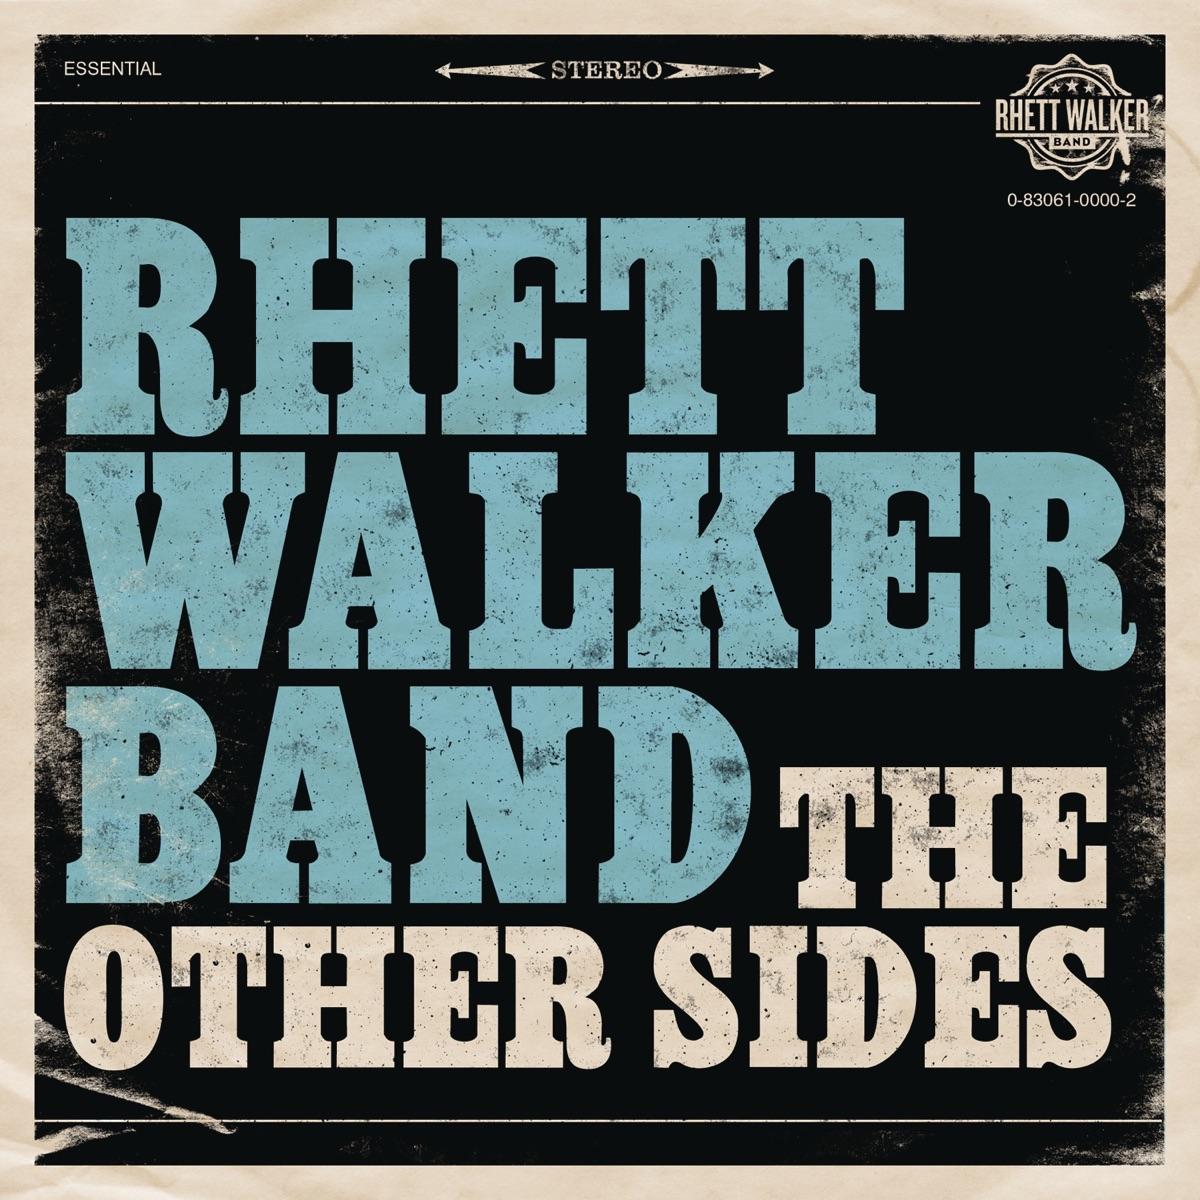 The Other Sides - EP Rhett Walker Band CD cover